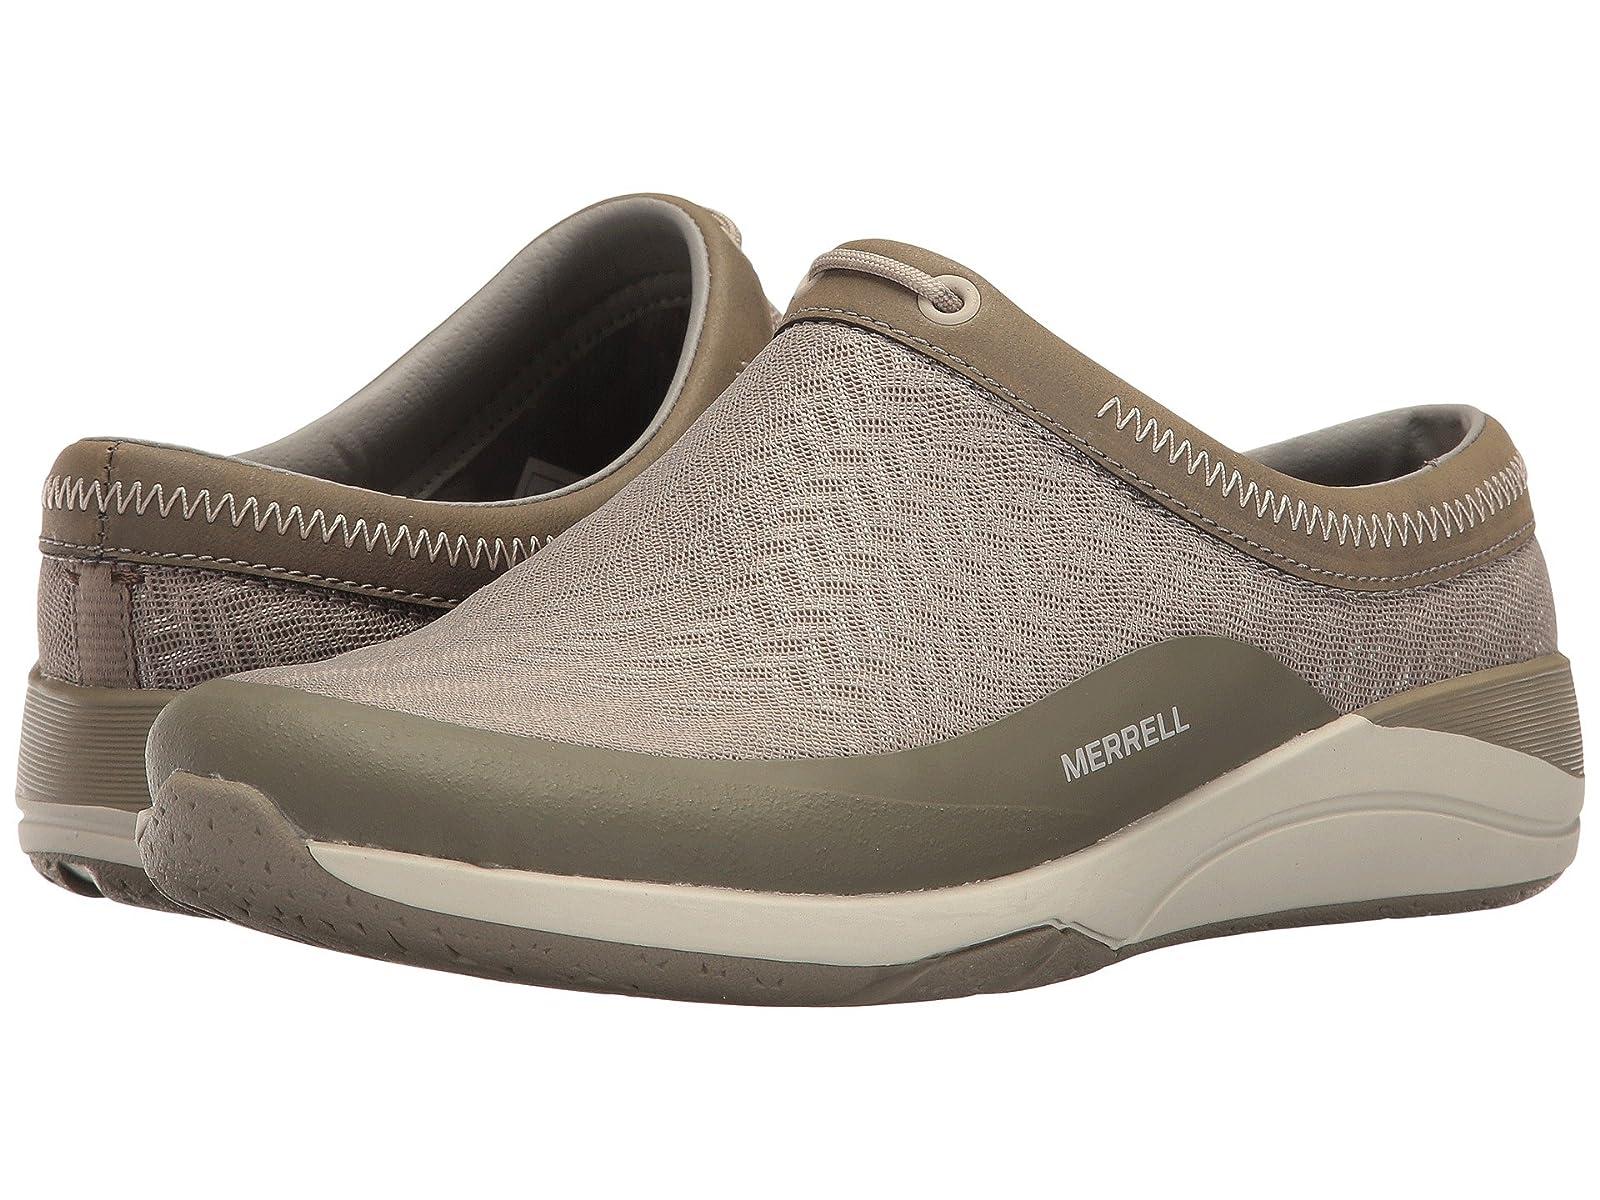 Merrell Applaud Mesh SlideCheap and distinctive eye-catching shoes